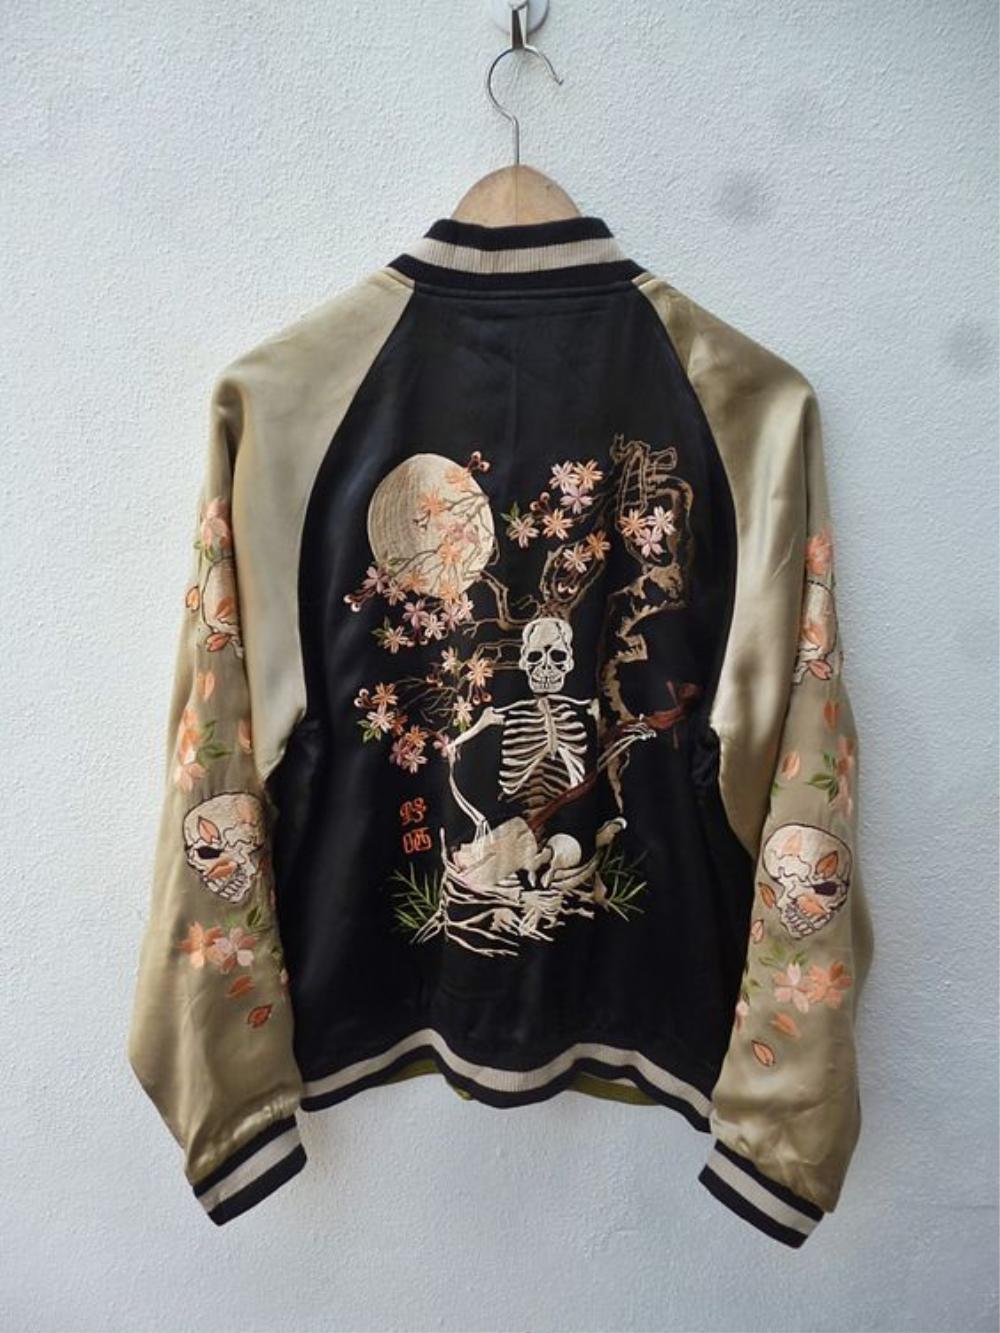 souvenirjacket3